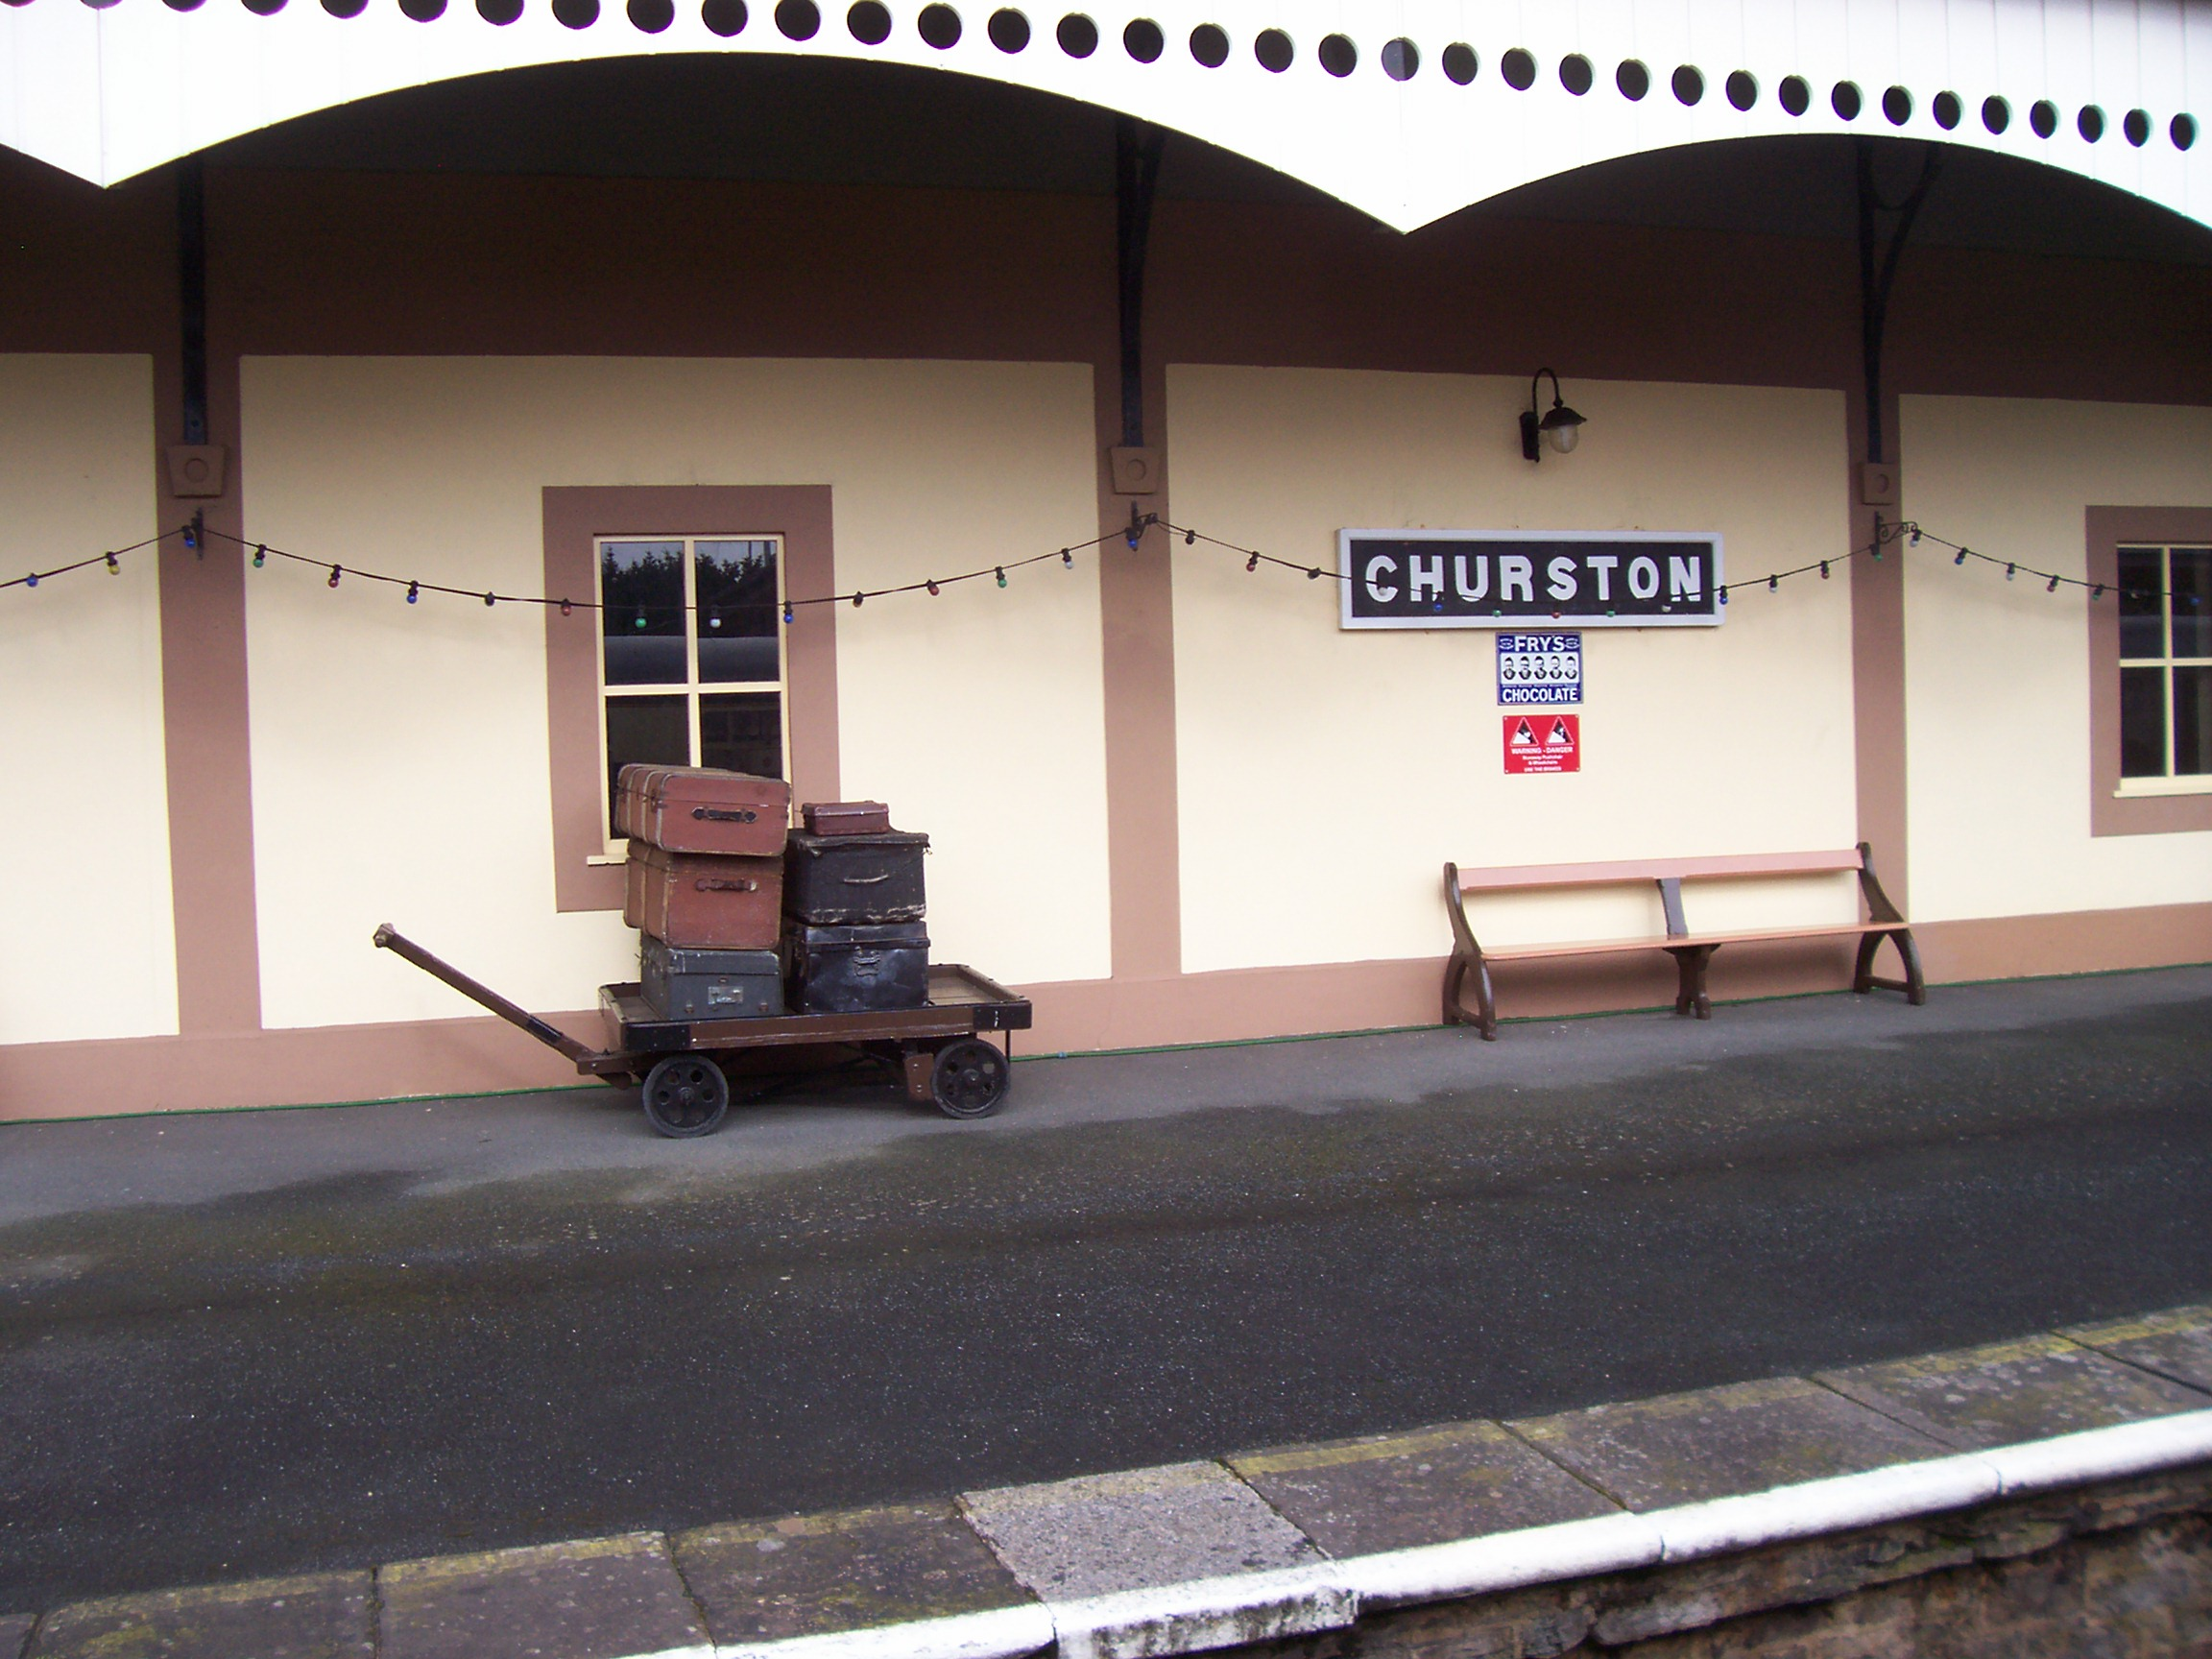 Churston Station